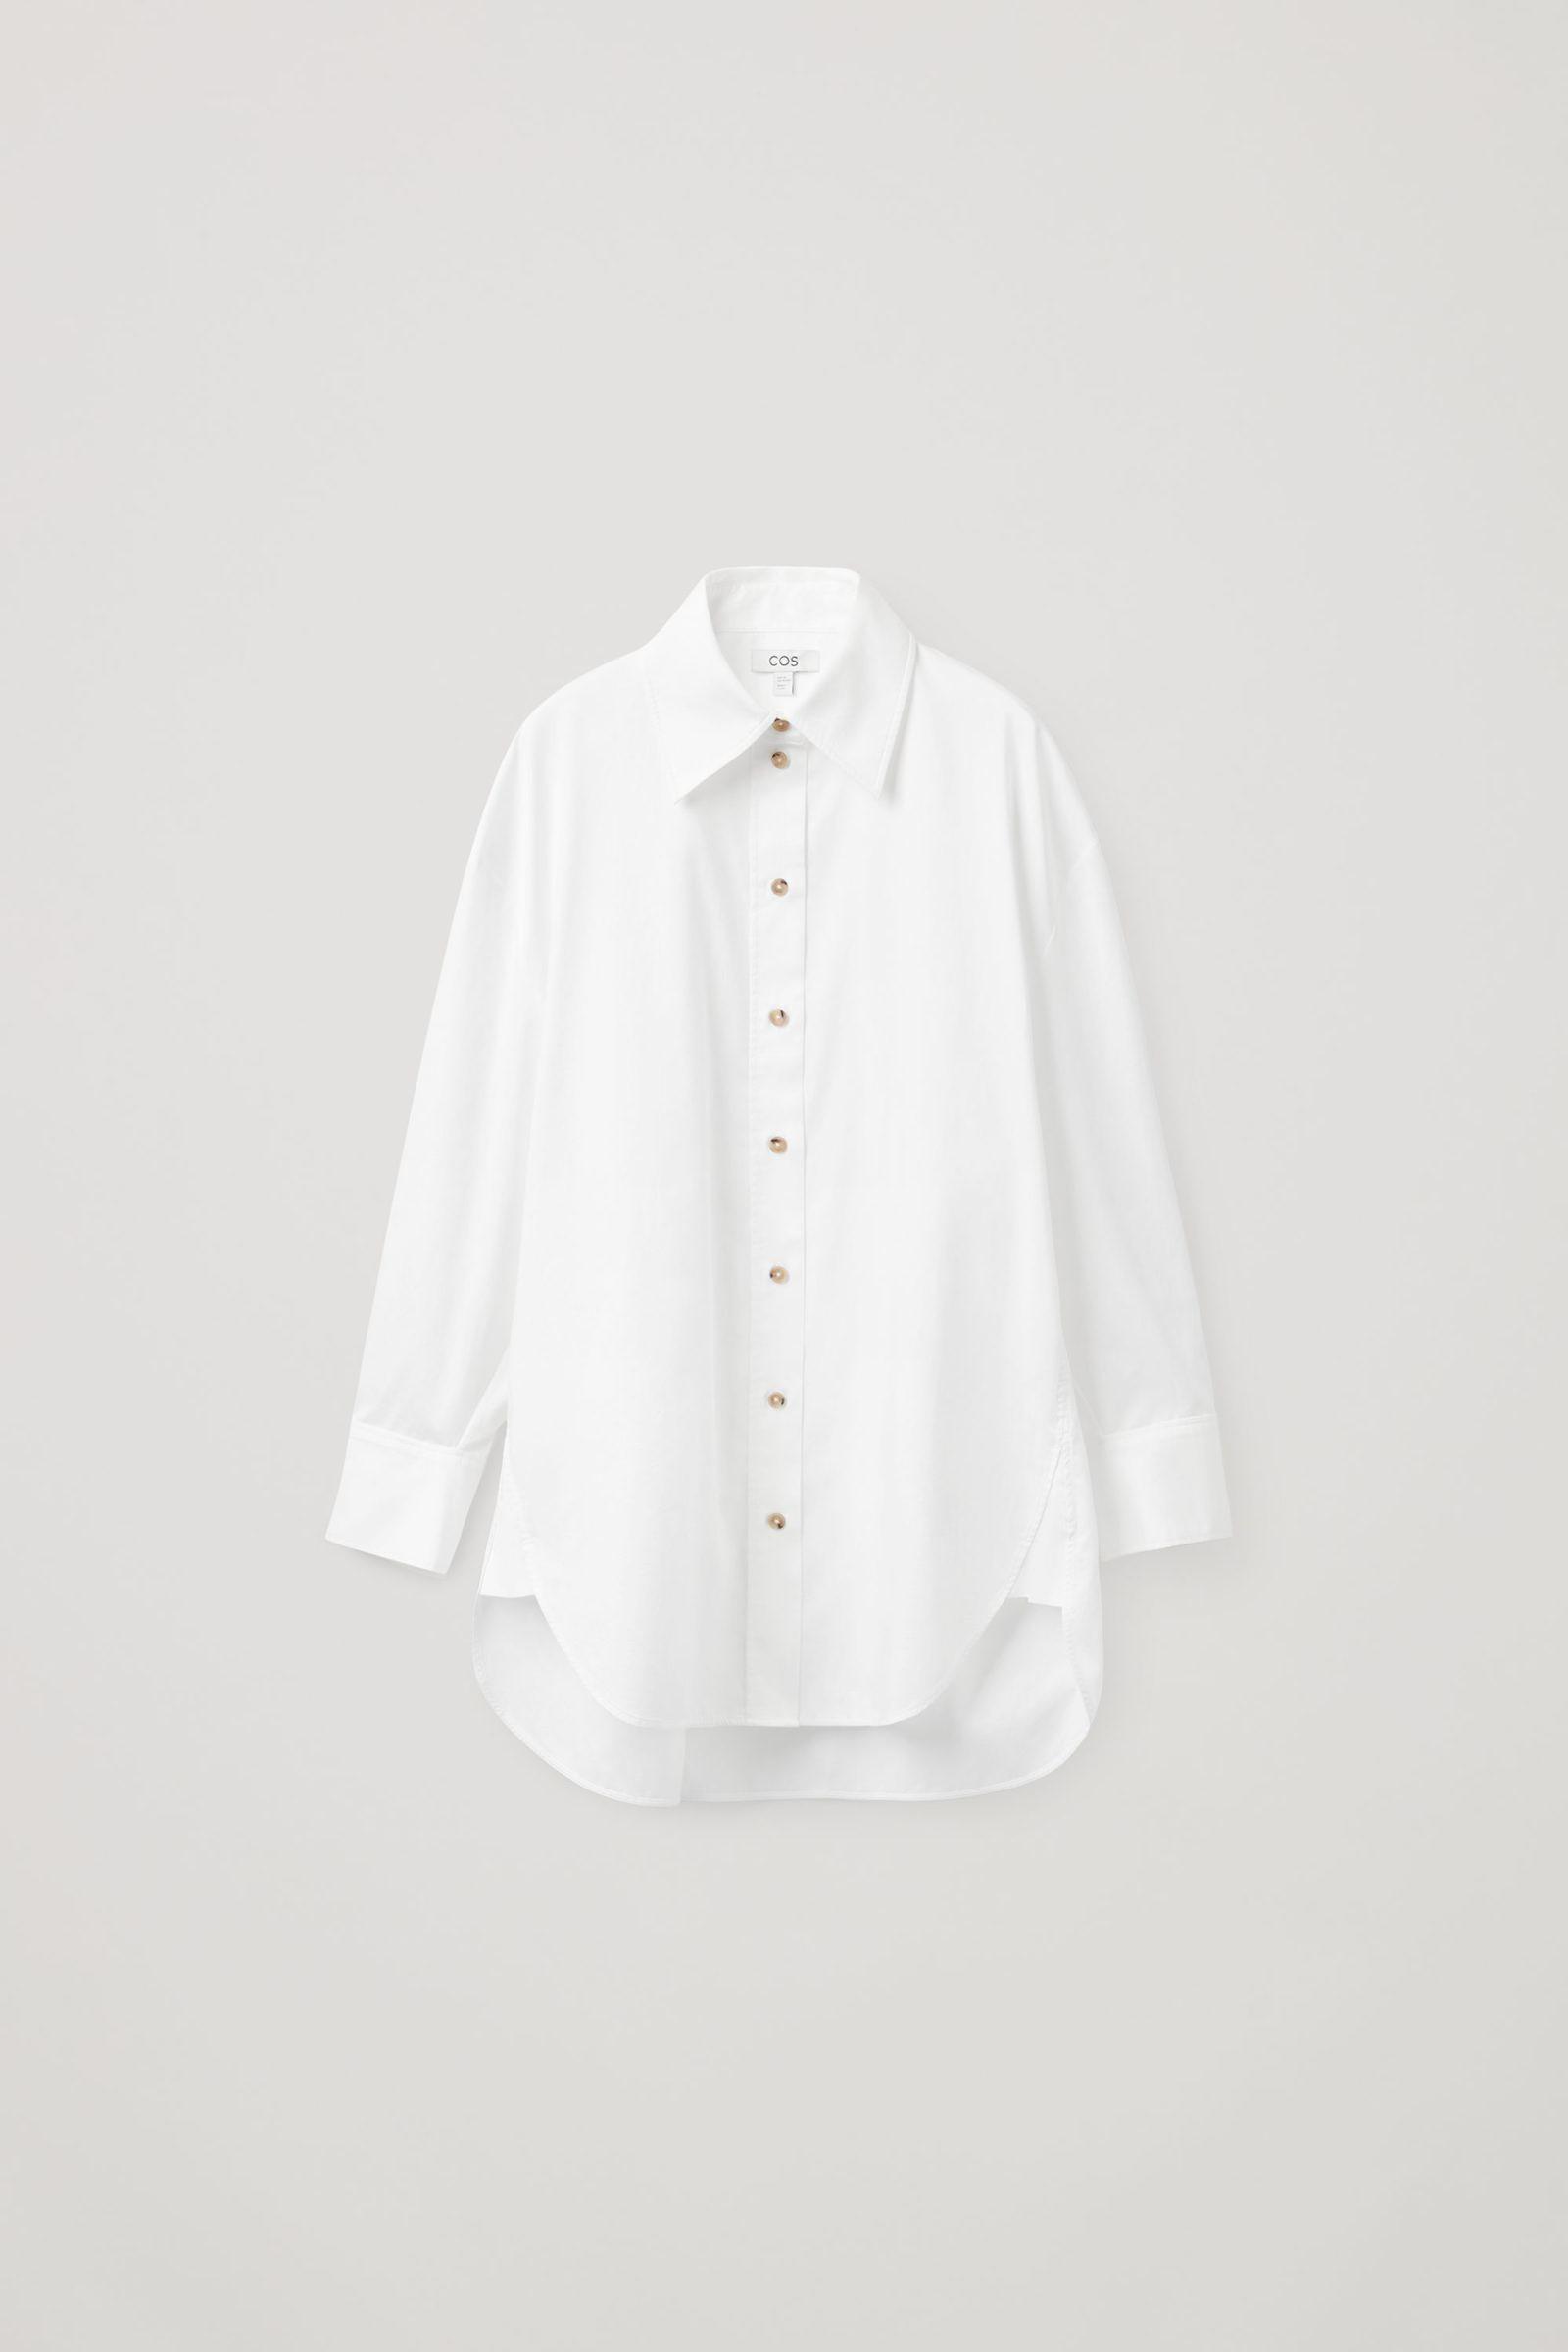 COS 오버사이즈 셔츠 의 화이트컬러 Product입니다.